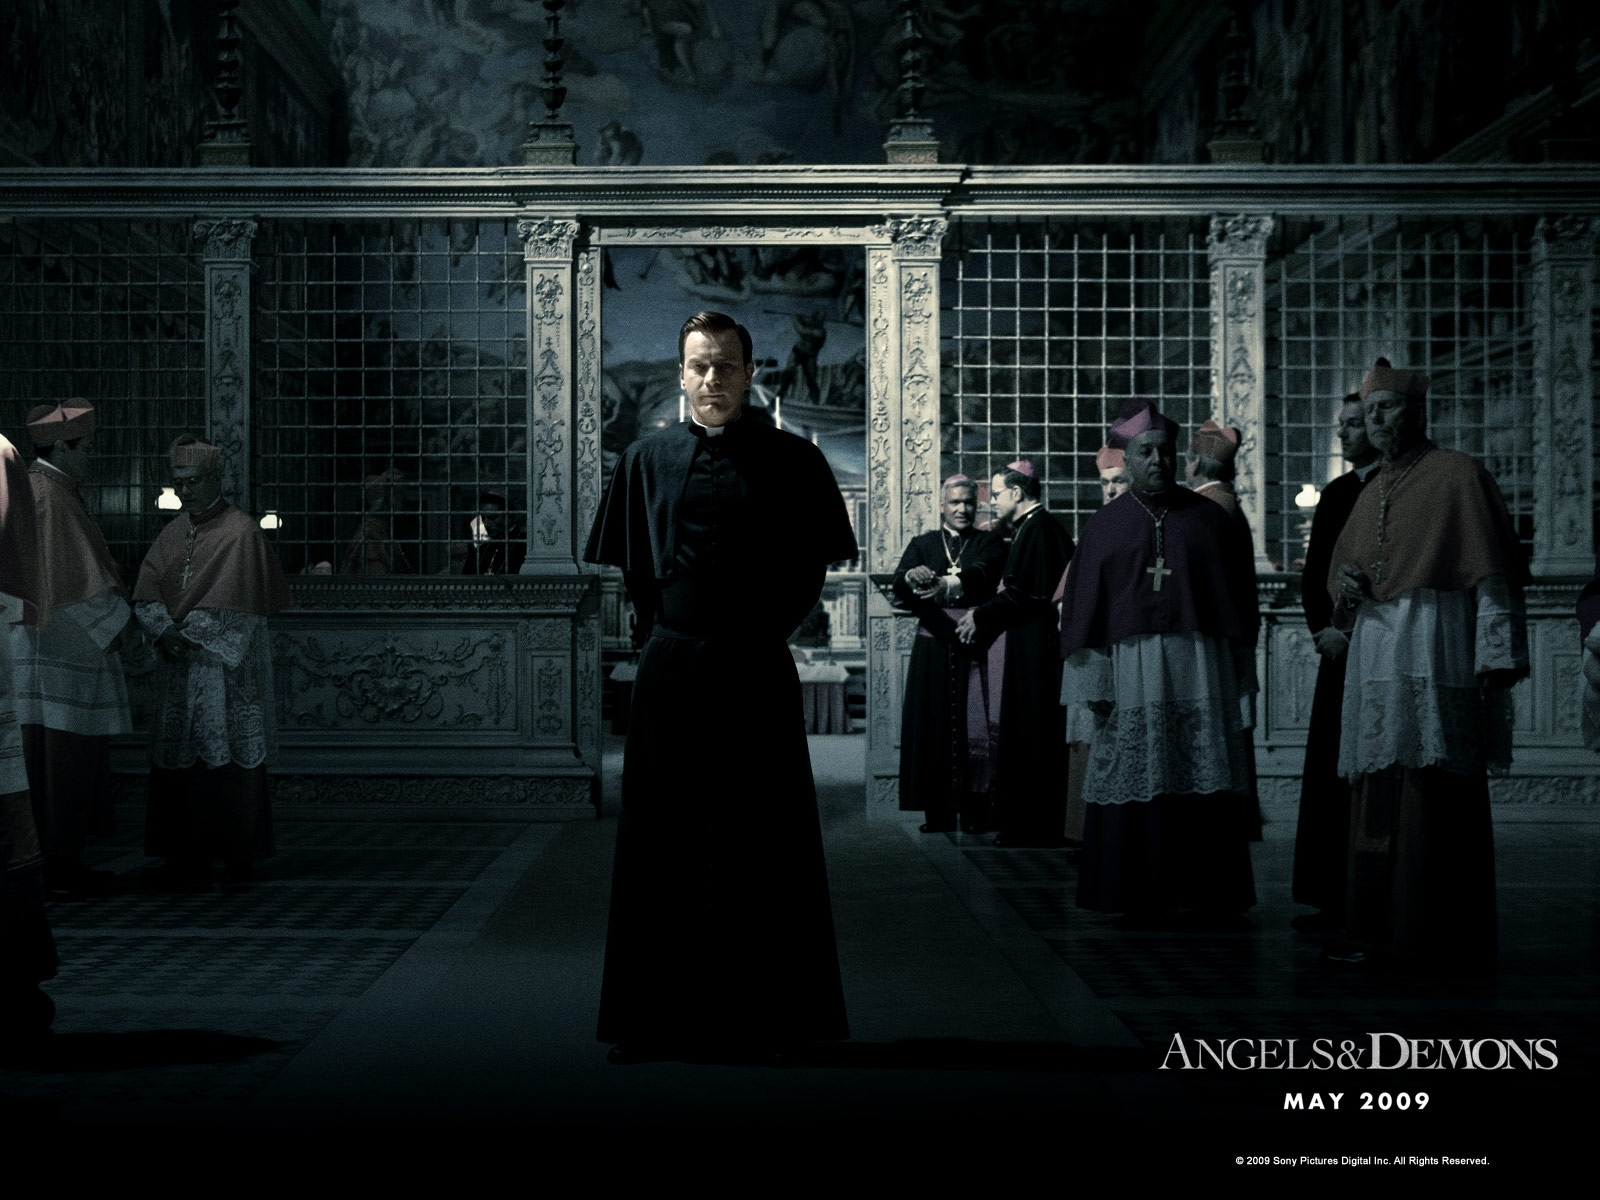 10608 download wallpaper Cinema, People, Actors, Men, Angels And Demons, Ewan Mcgregor screensavers and pictures for free